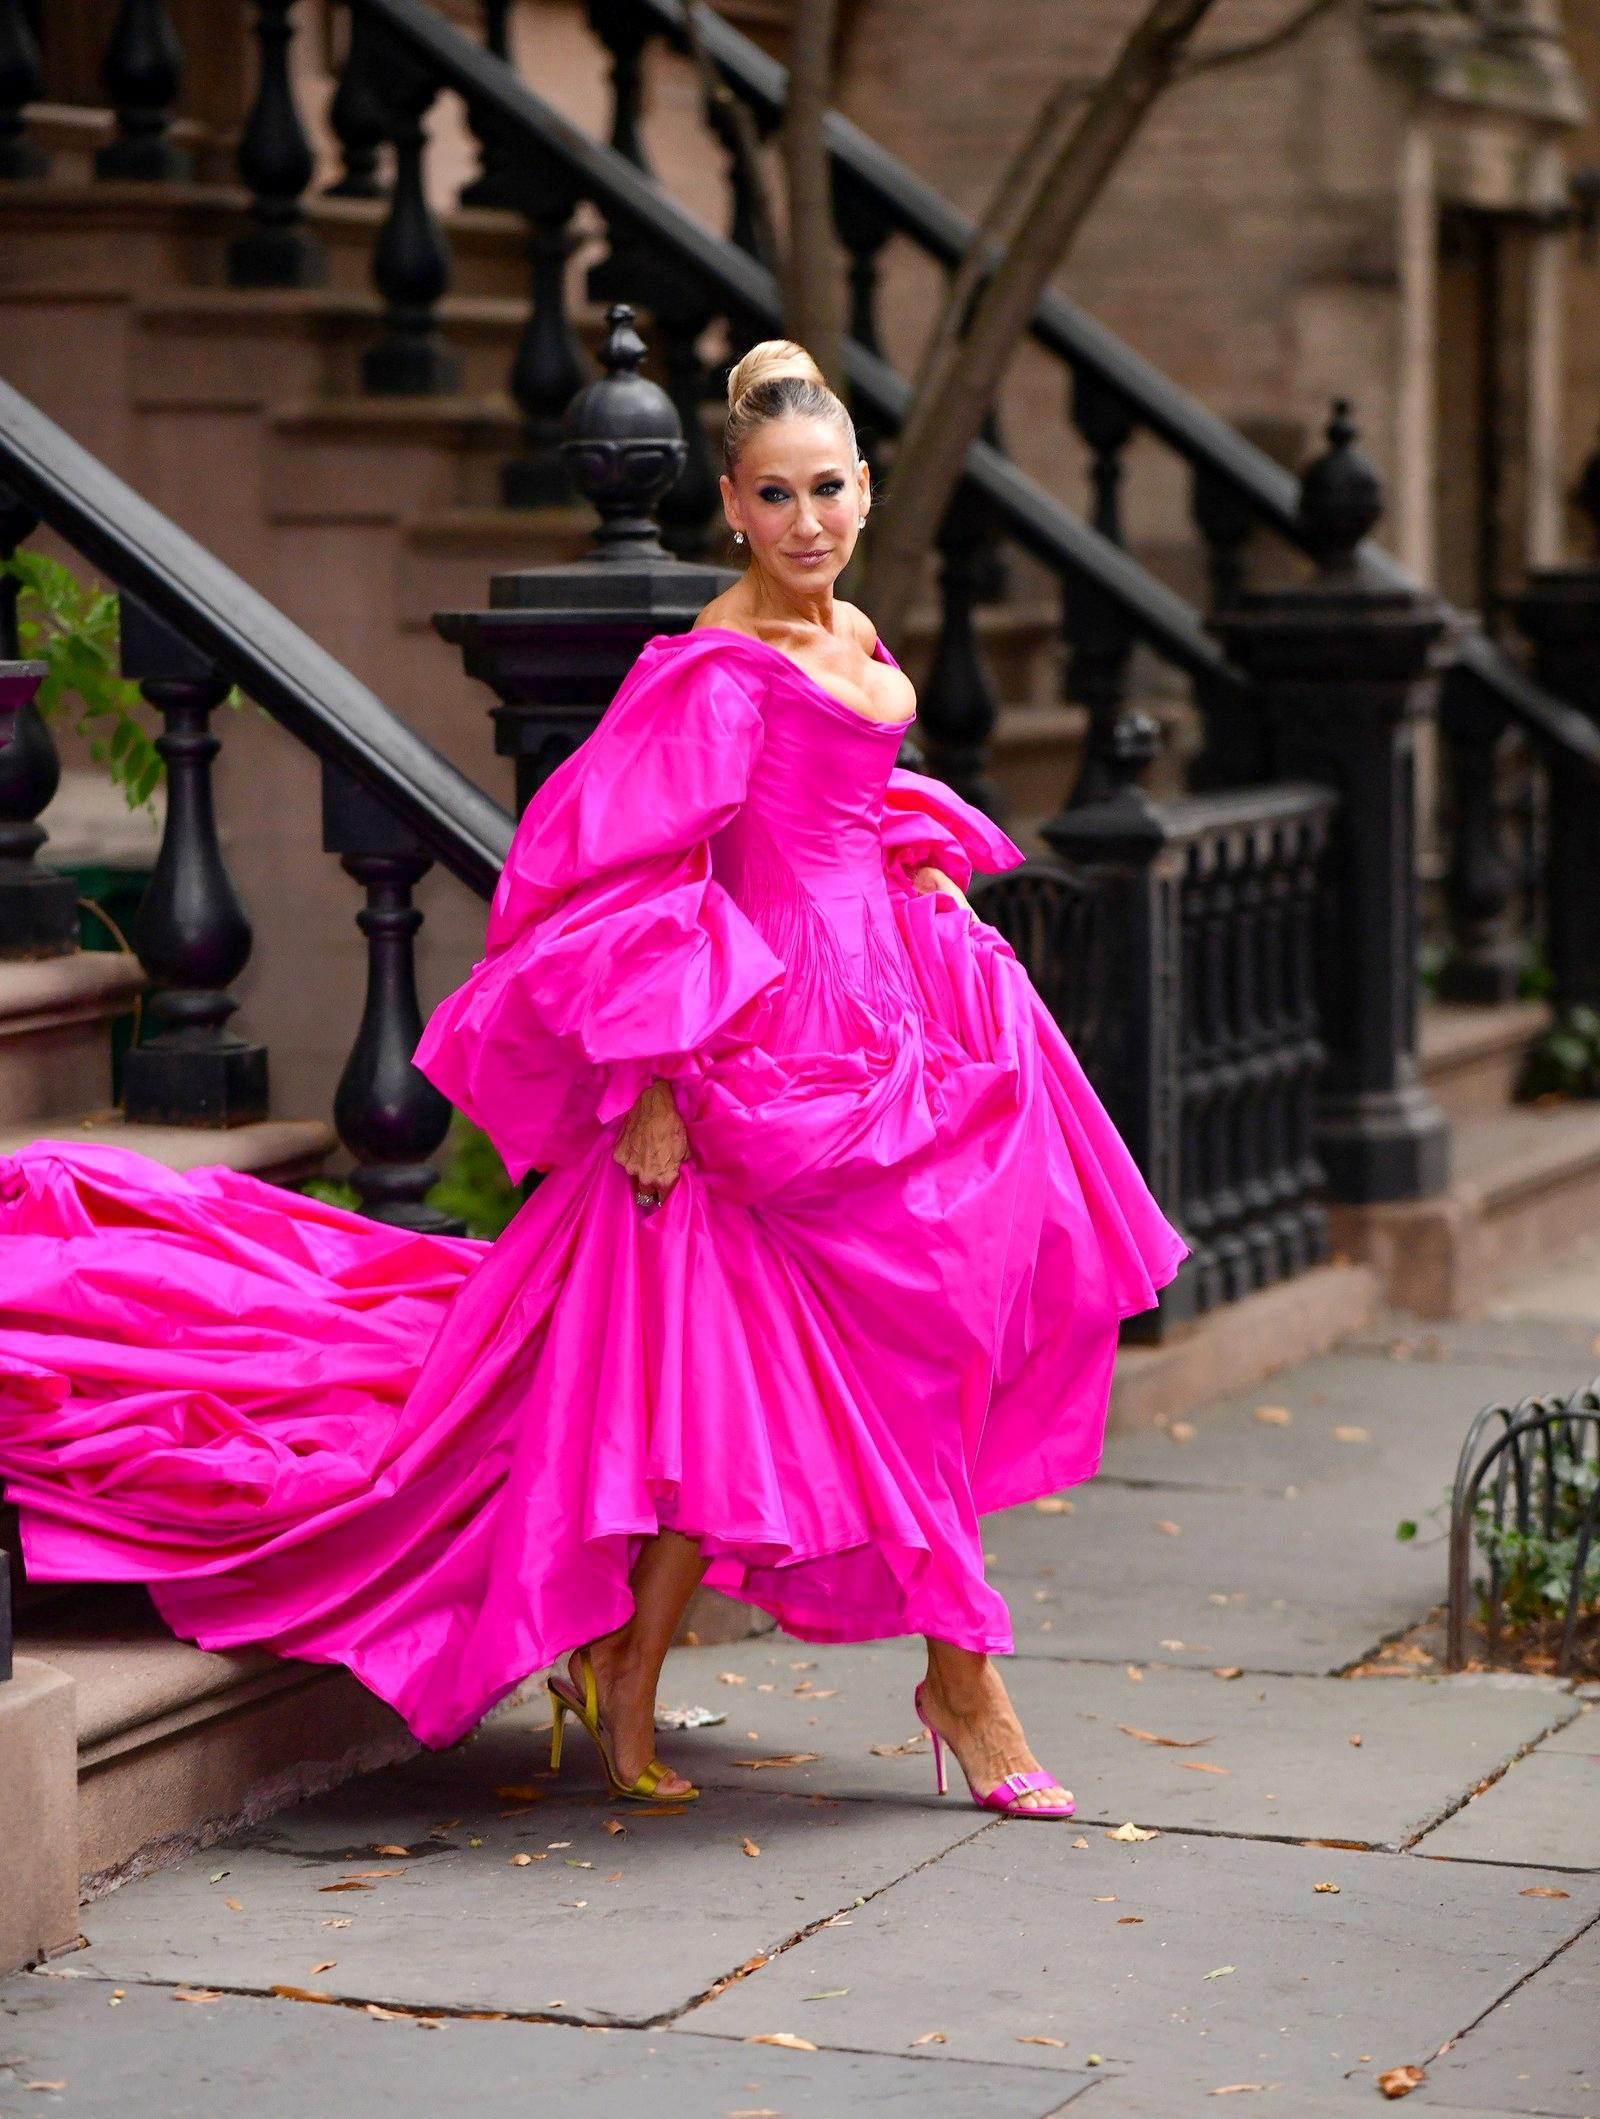 Сара Джессика Паркер в платье Zac Posen